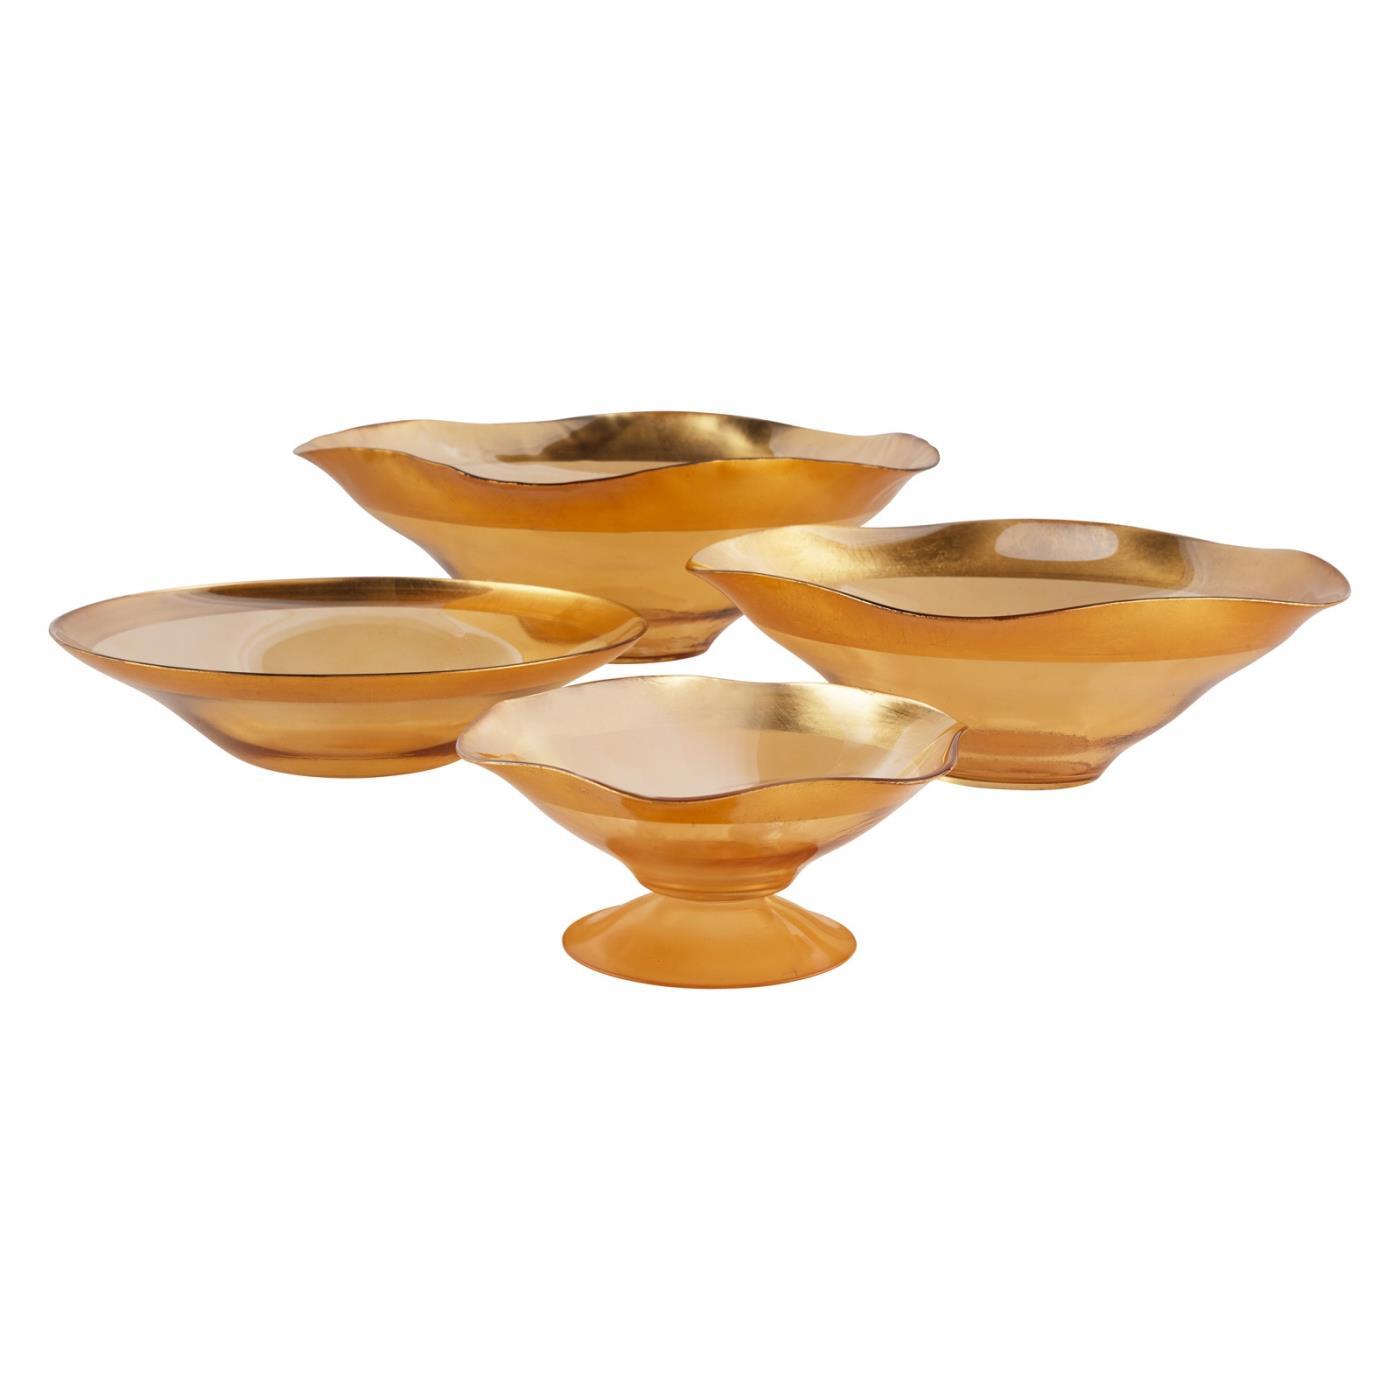 Gold Luster Bowl - 12.5